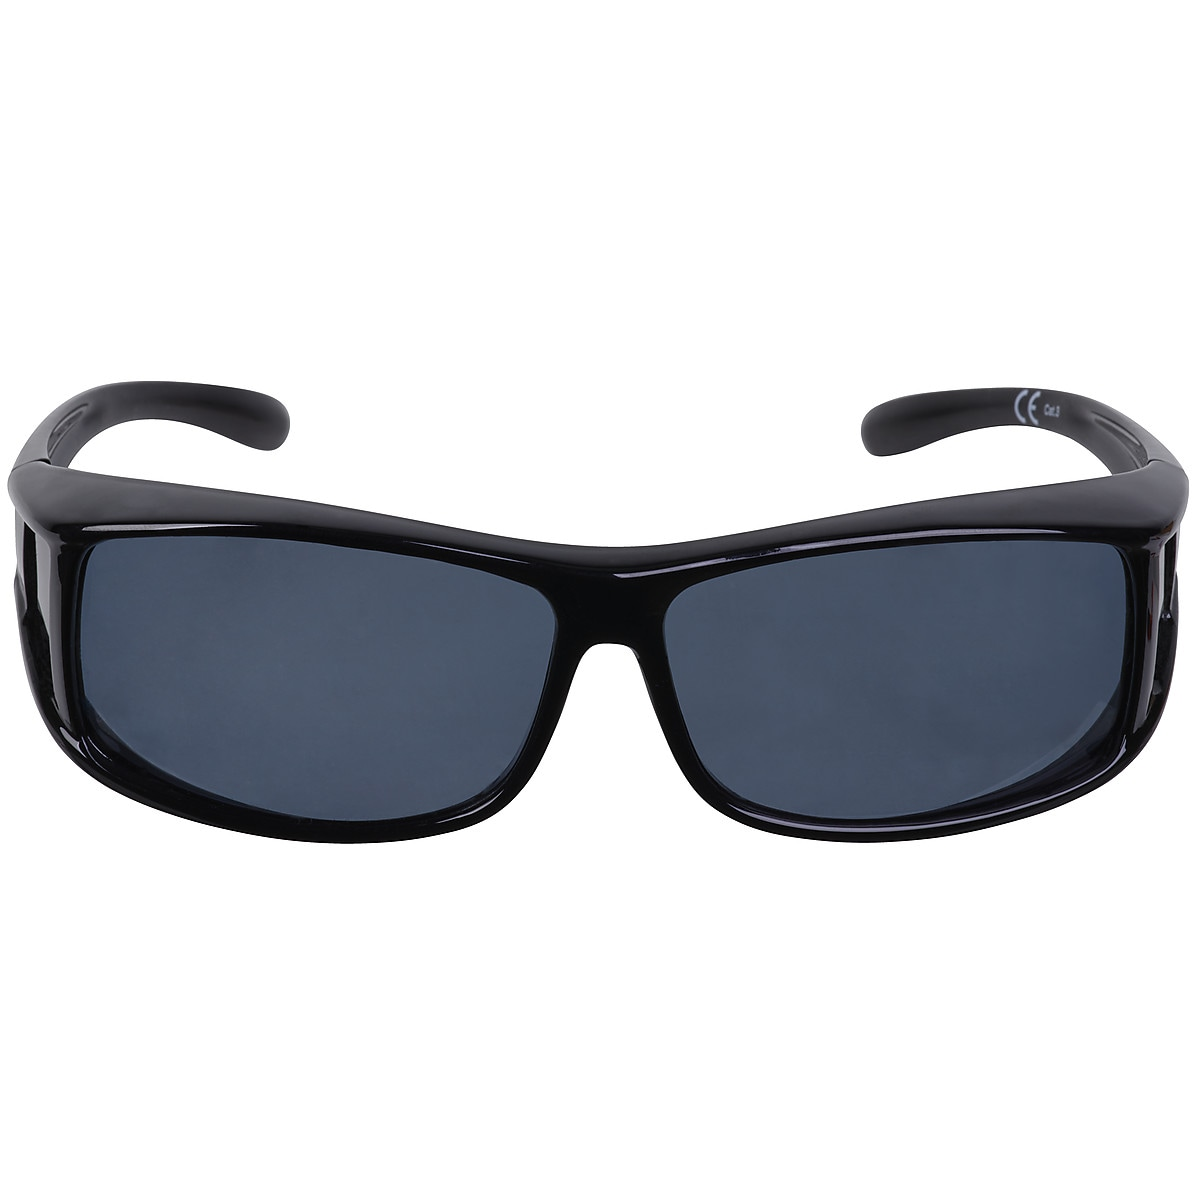 OTG solbriller